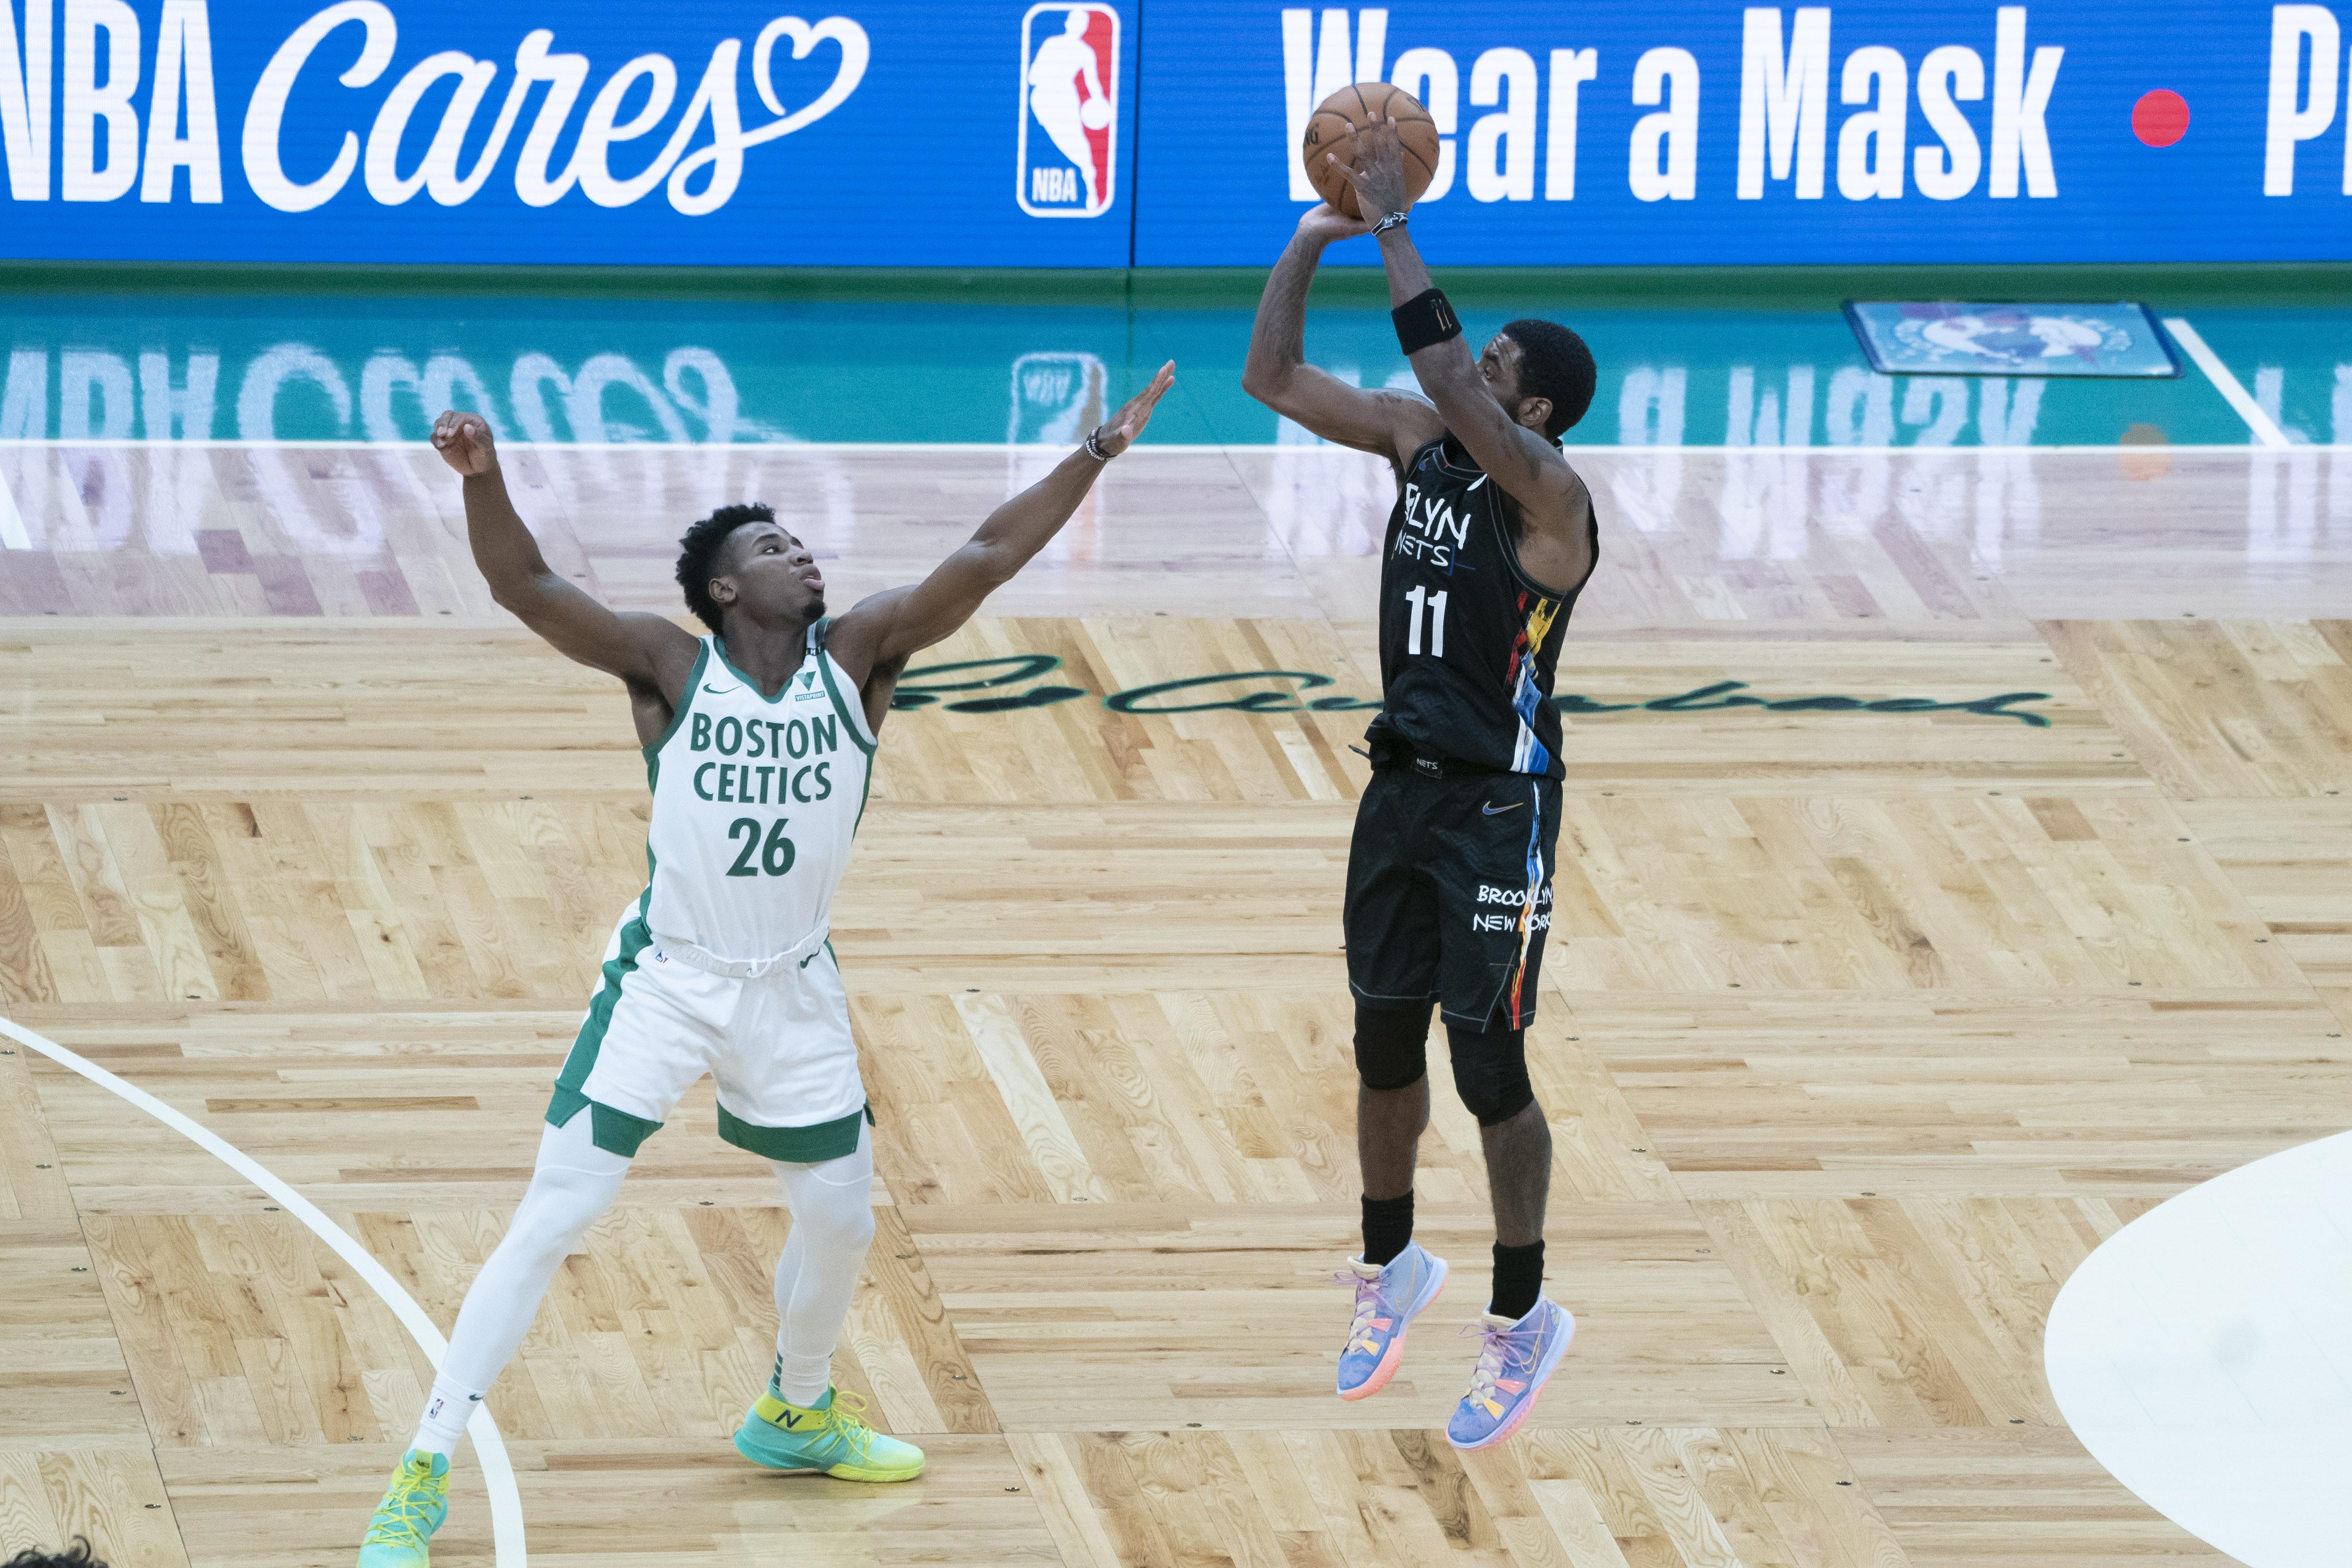 Boston Celtics rookie Aaron Nesmith struggles, but 'he'll get plenty of opportunities'